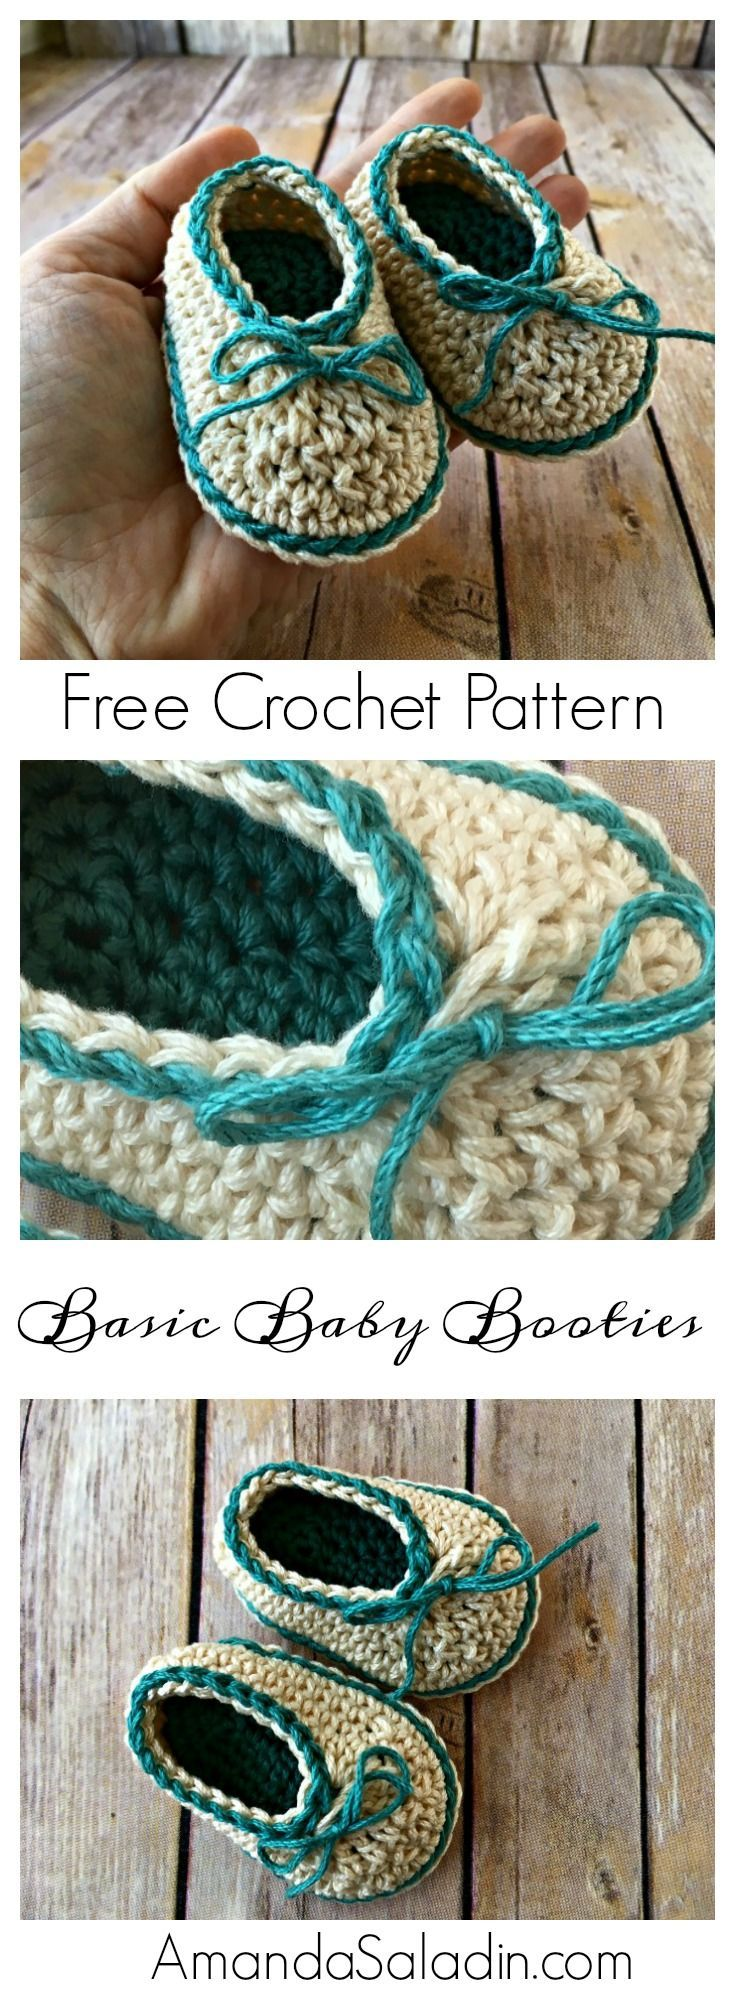 Basic Baby Booties - Free Crochet Pattern | Babybody, Gestricktes ...